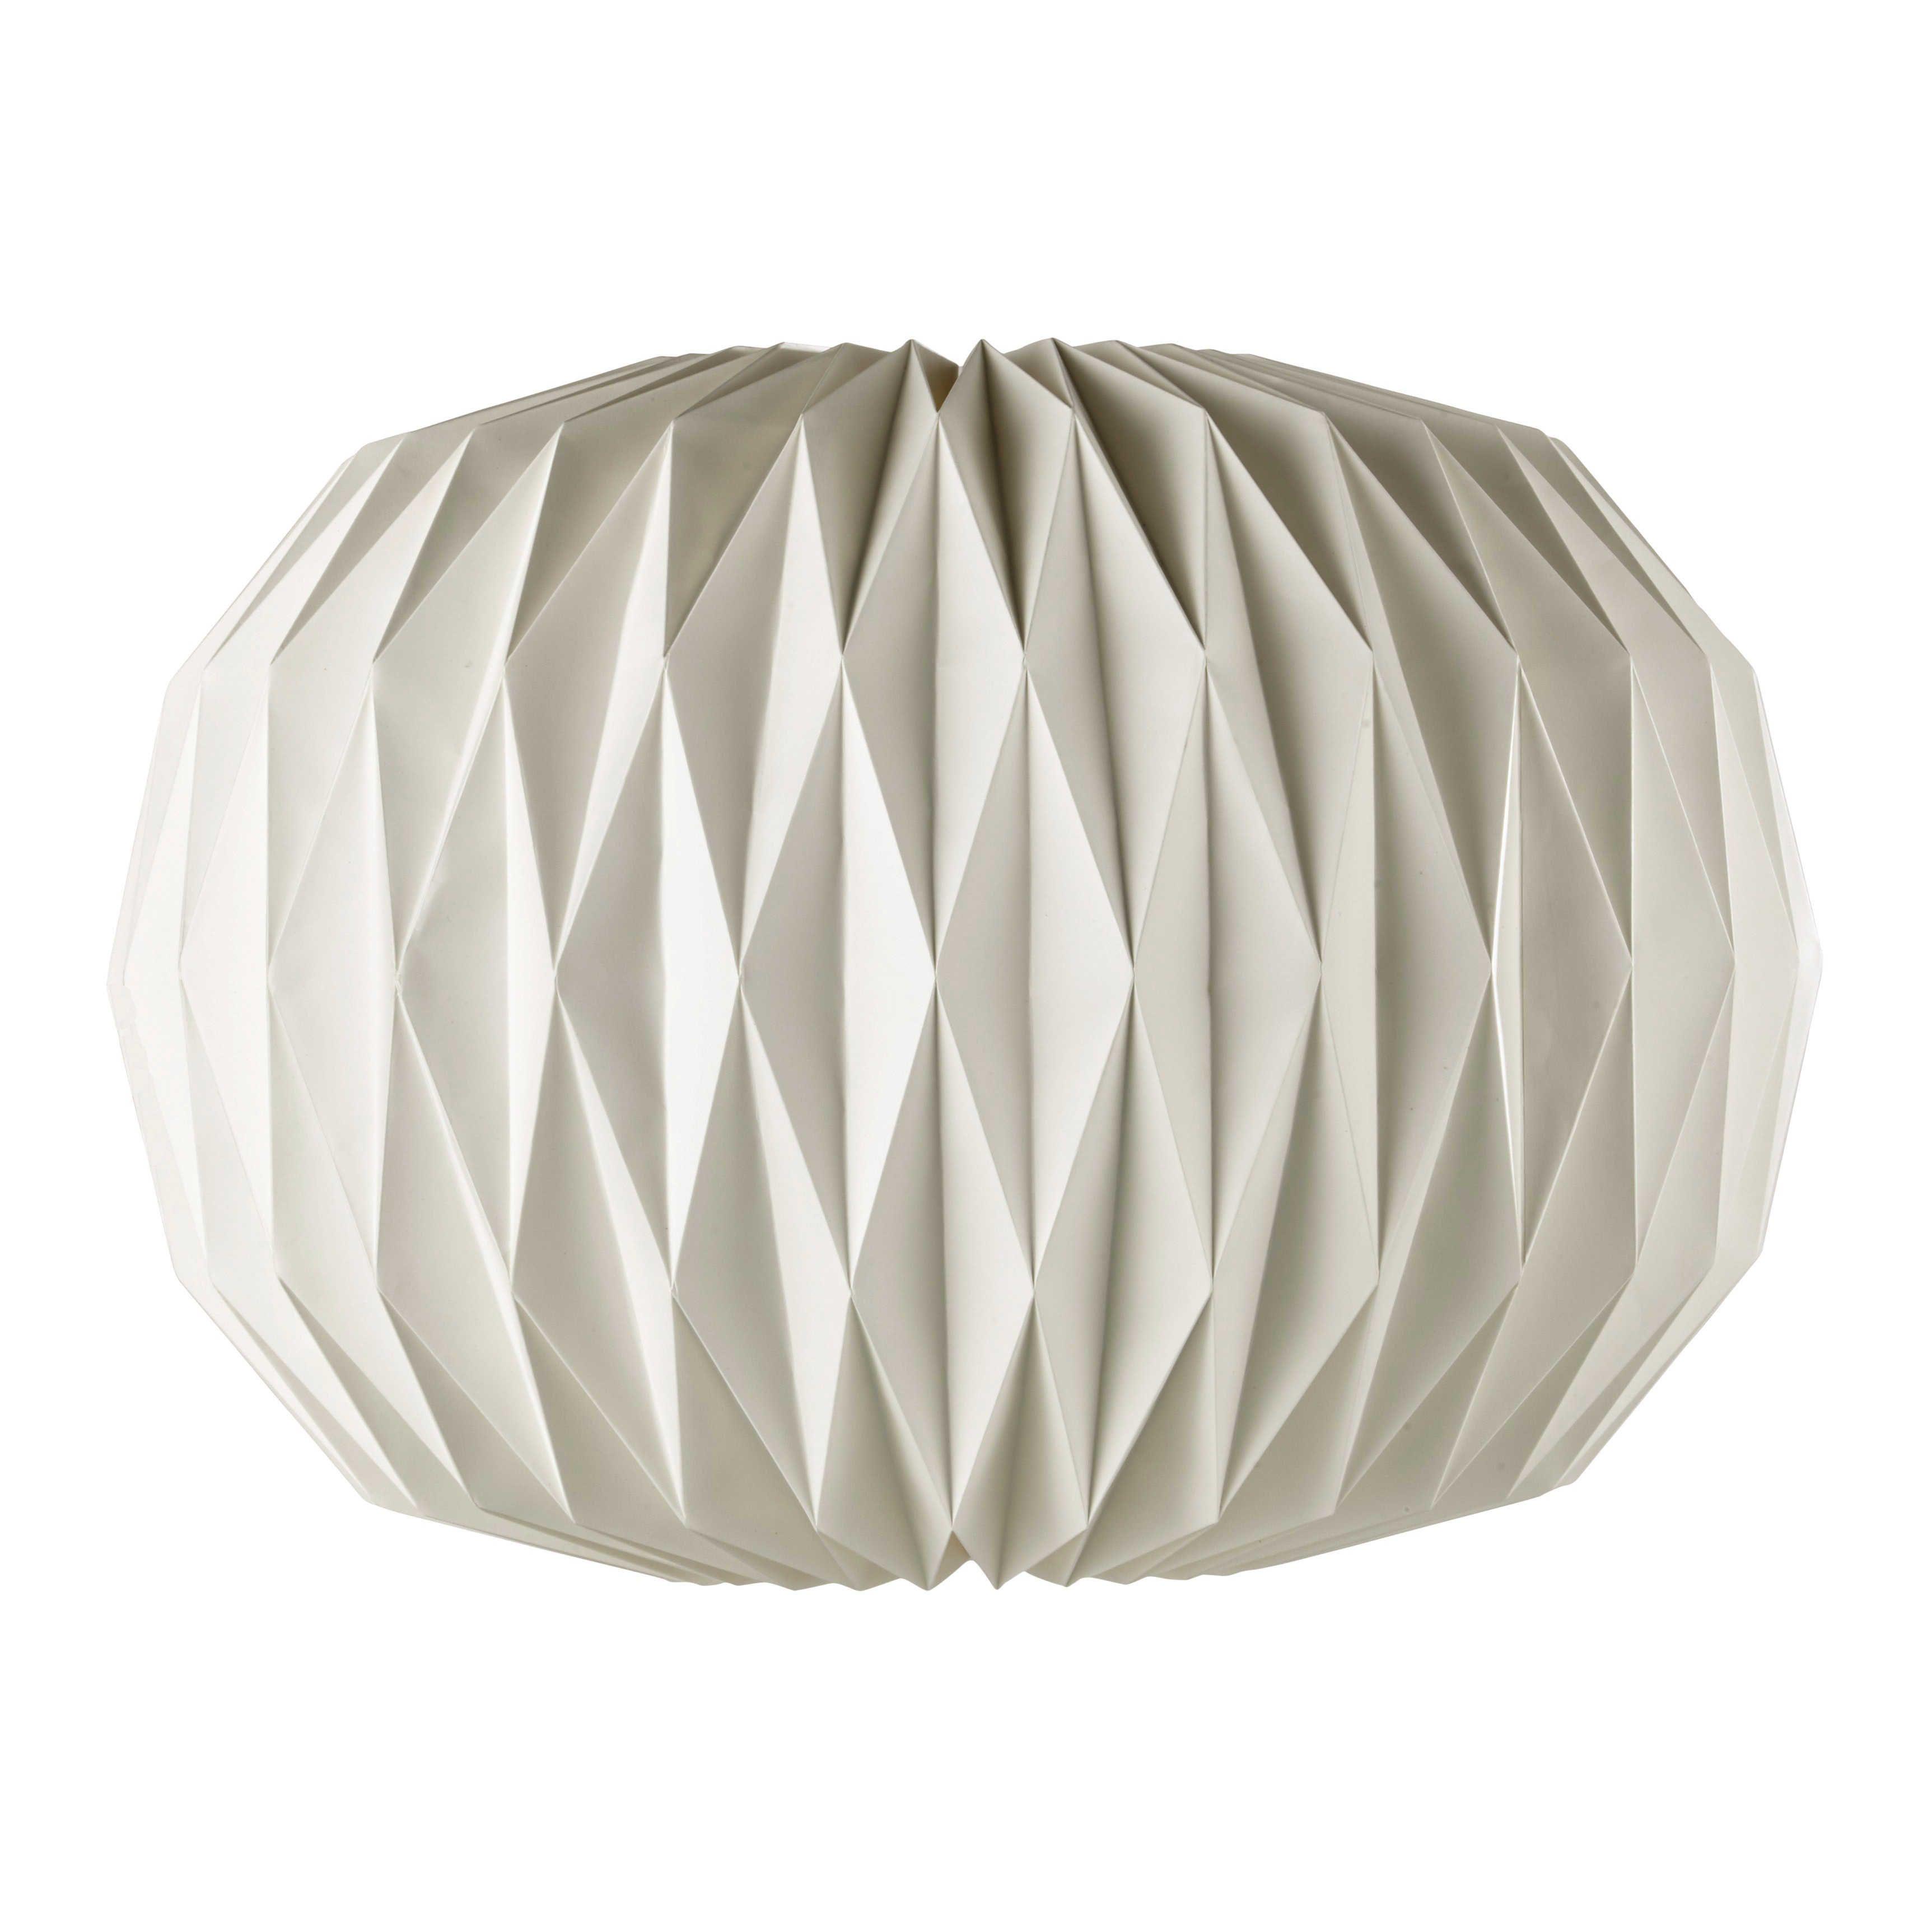 Lampada a sospensione non elettrificata bianca in carta D 70 cm ZEN